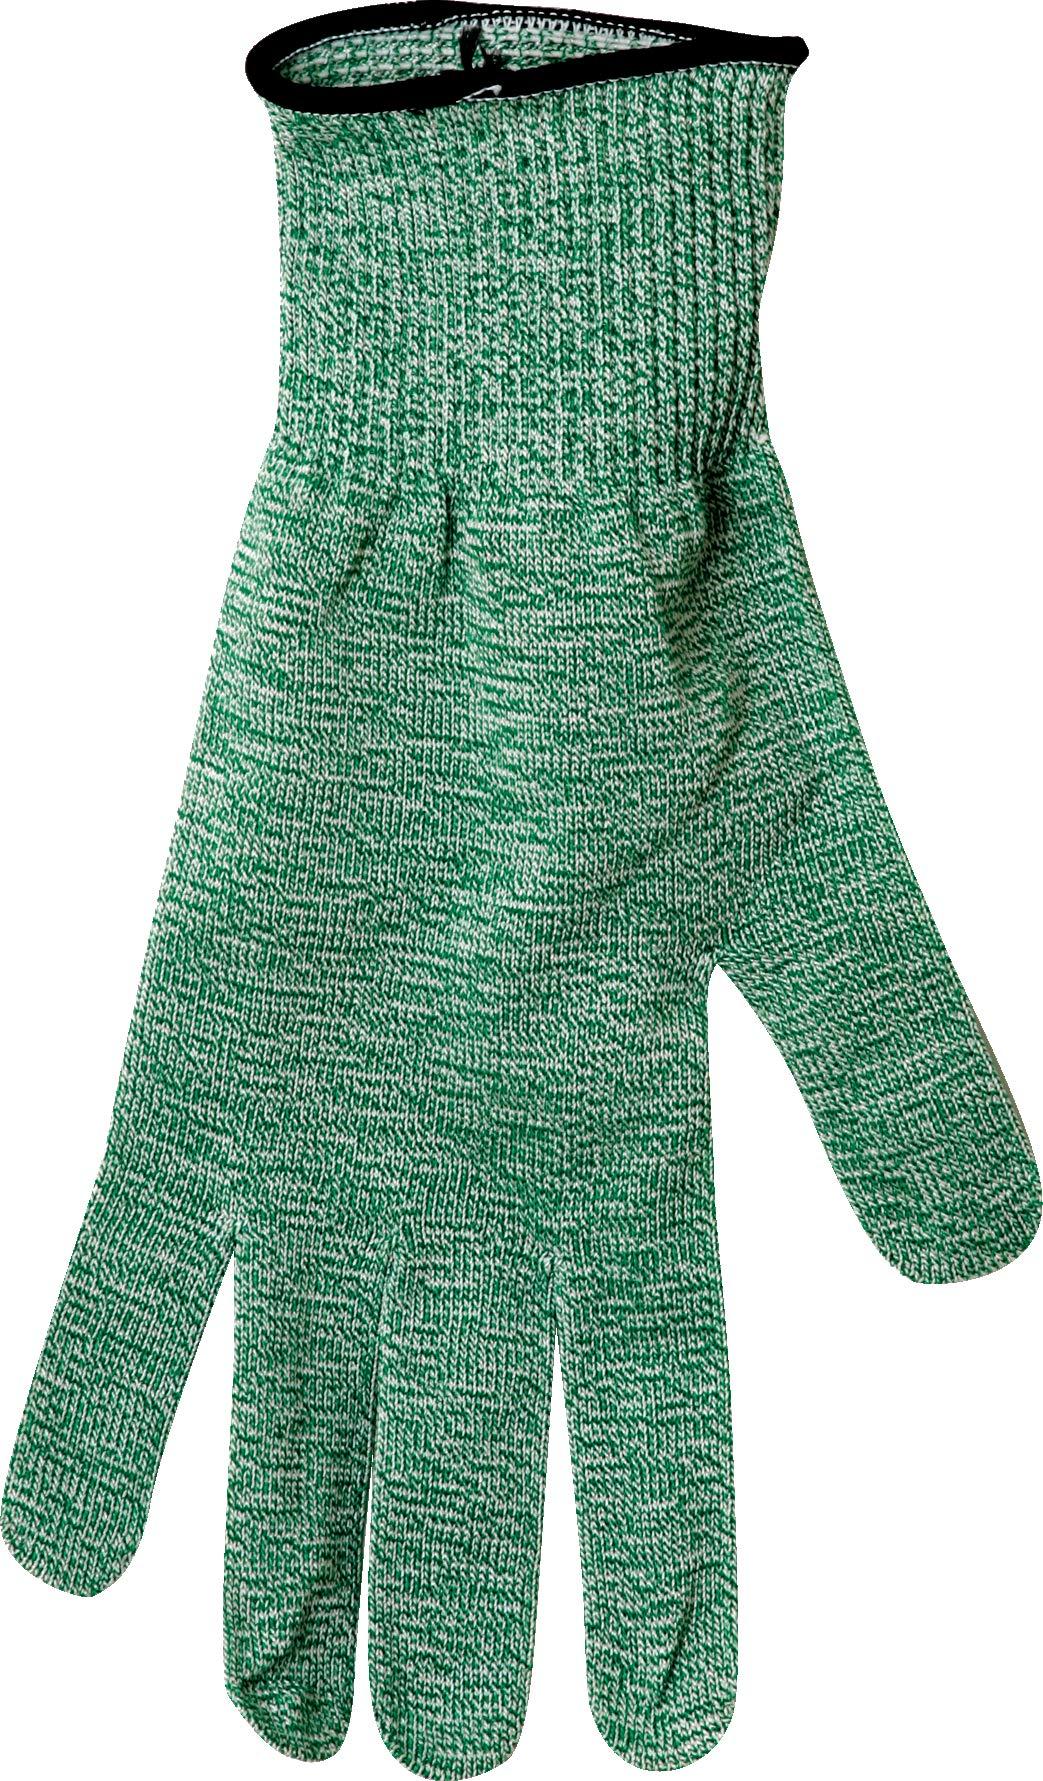 San Jamar SG10-GN-M Spectra Professional Cut-Resistant Glove, Medium, Green